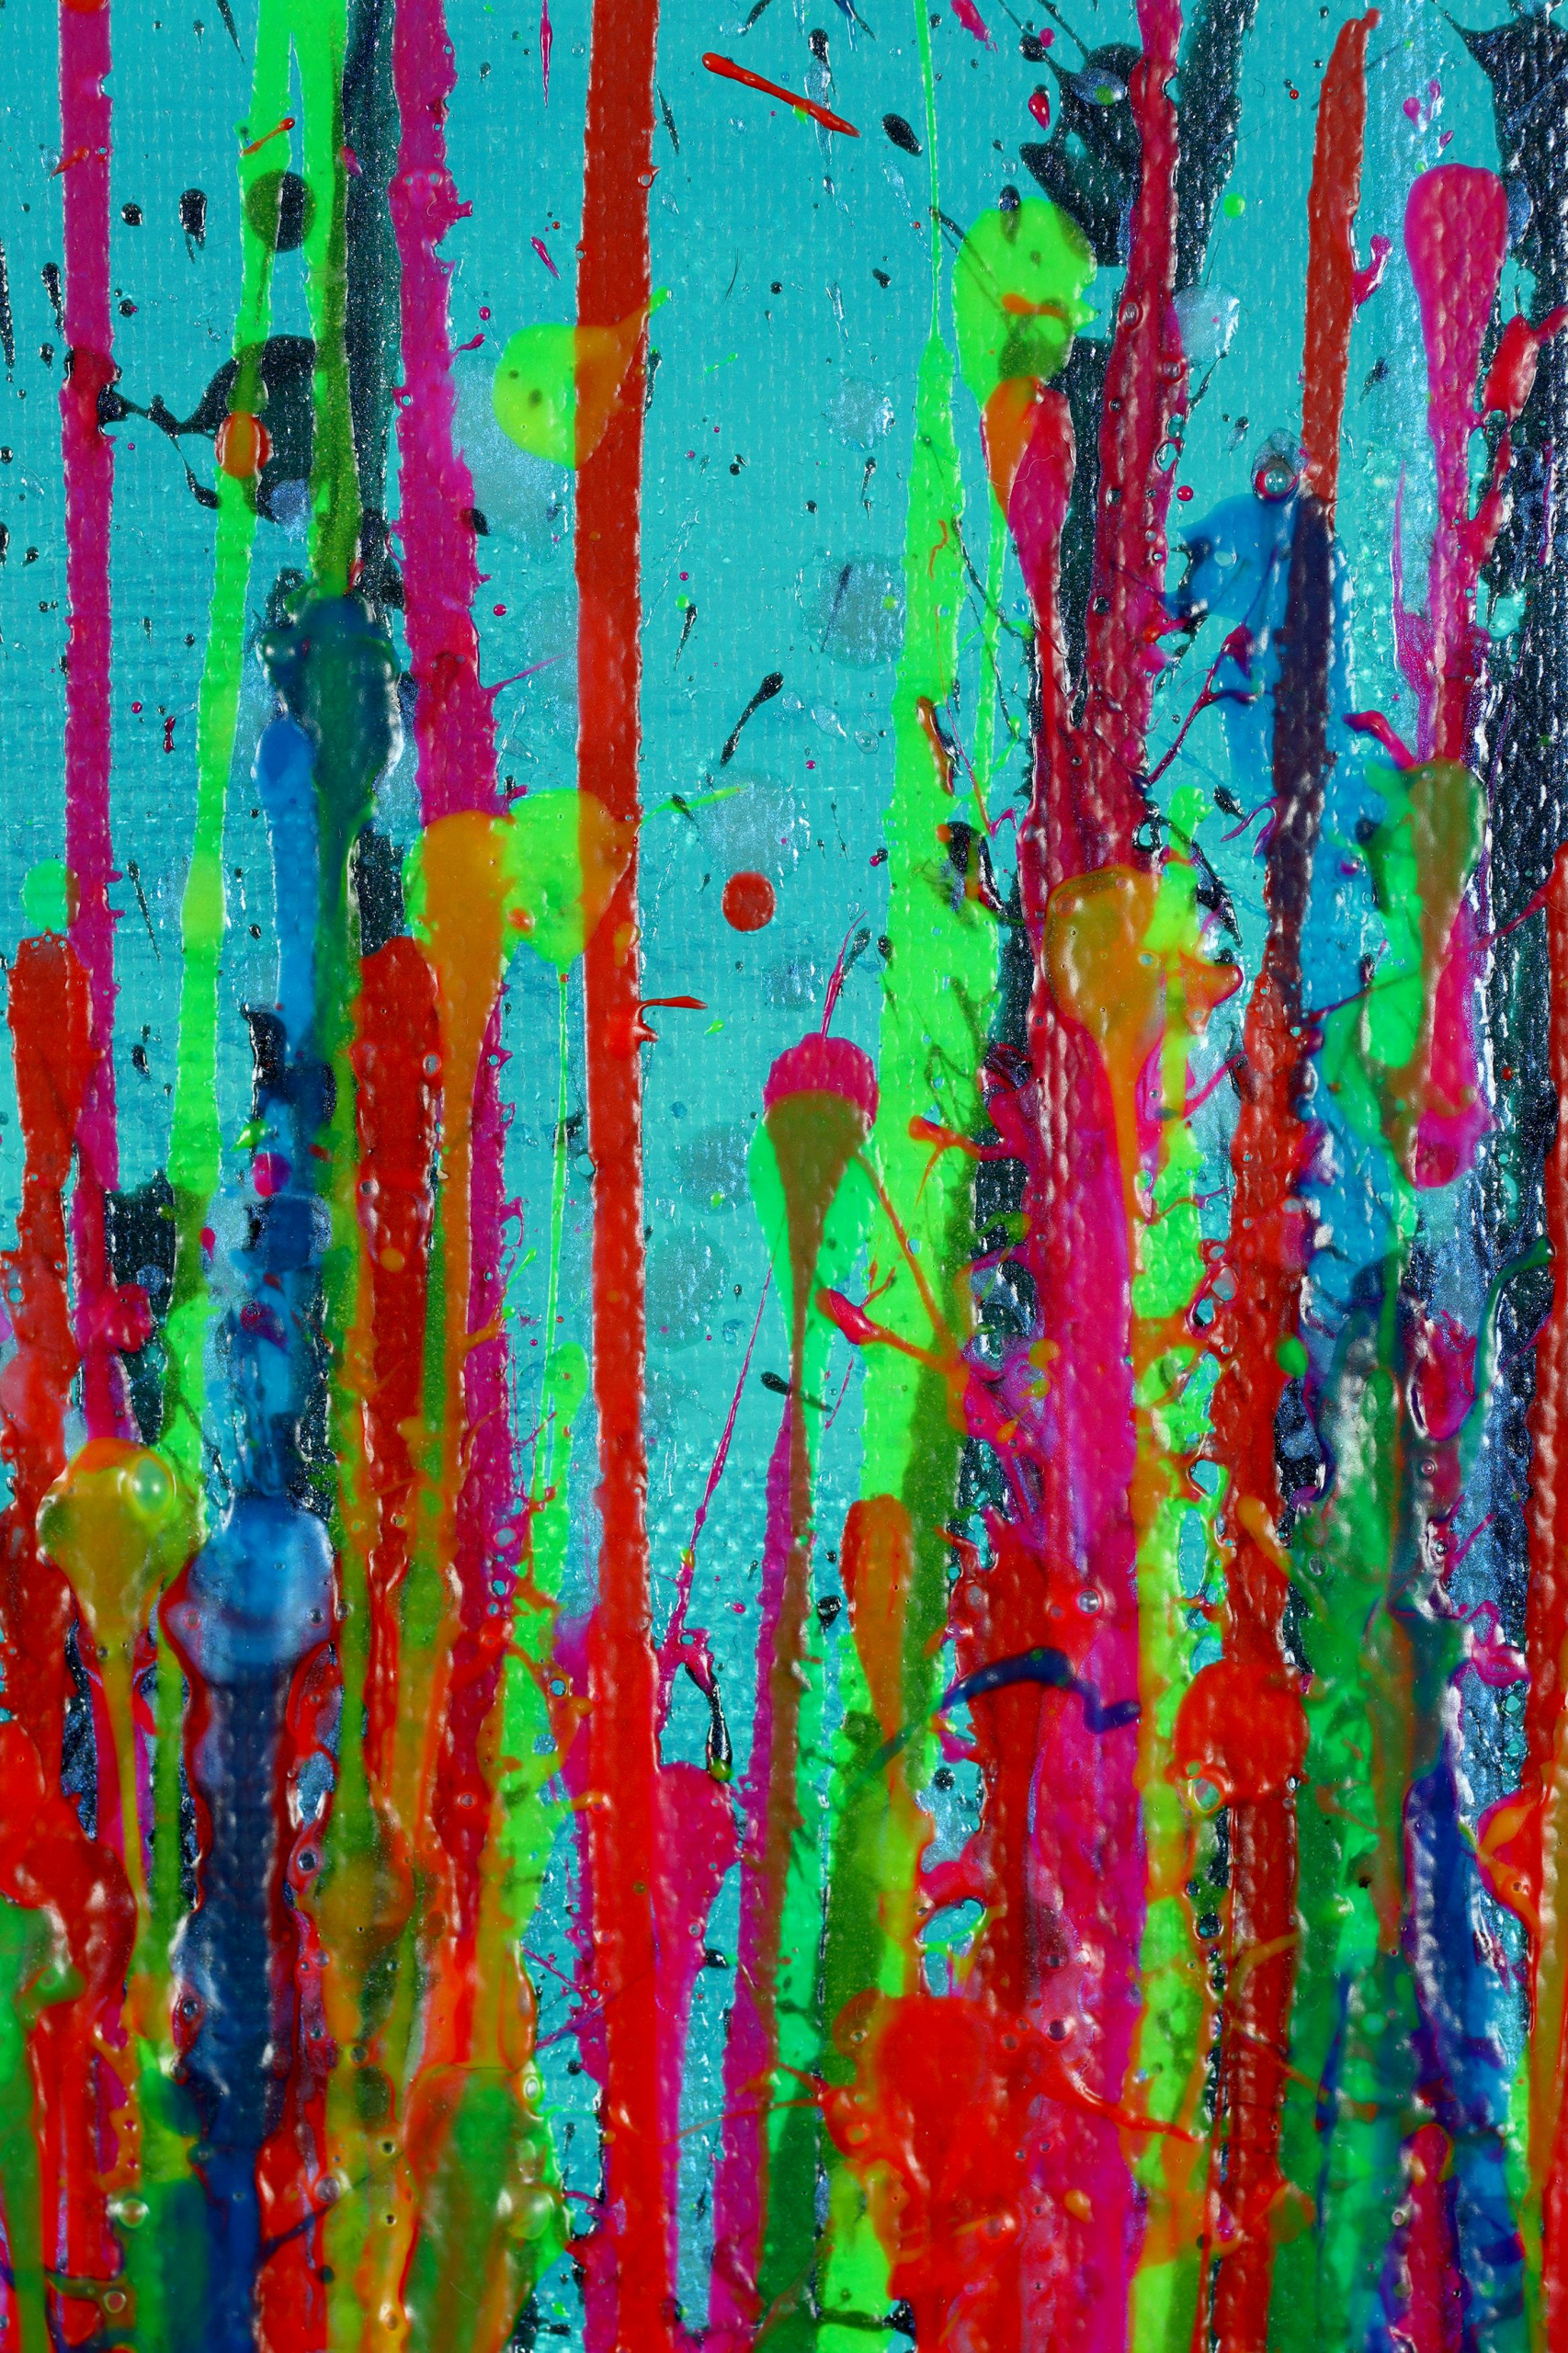 Caribbean Reflections 6 (2021) / Artist: Nestor Toro